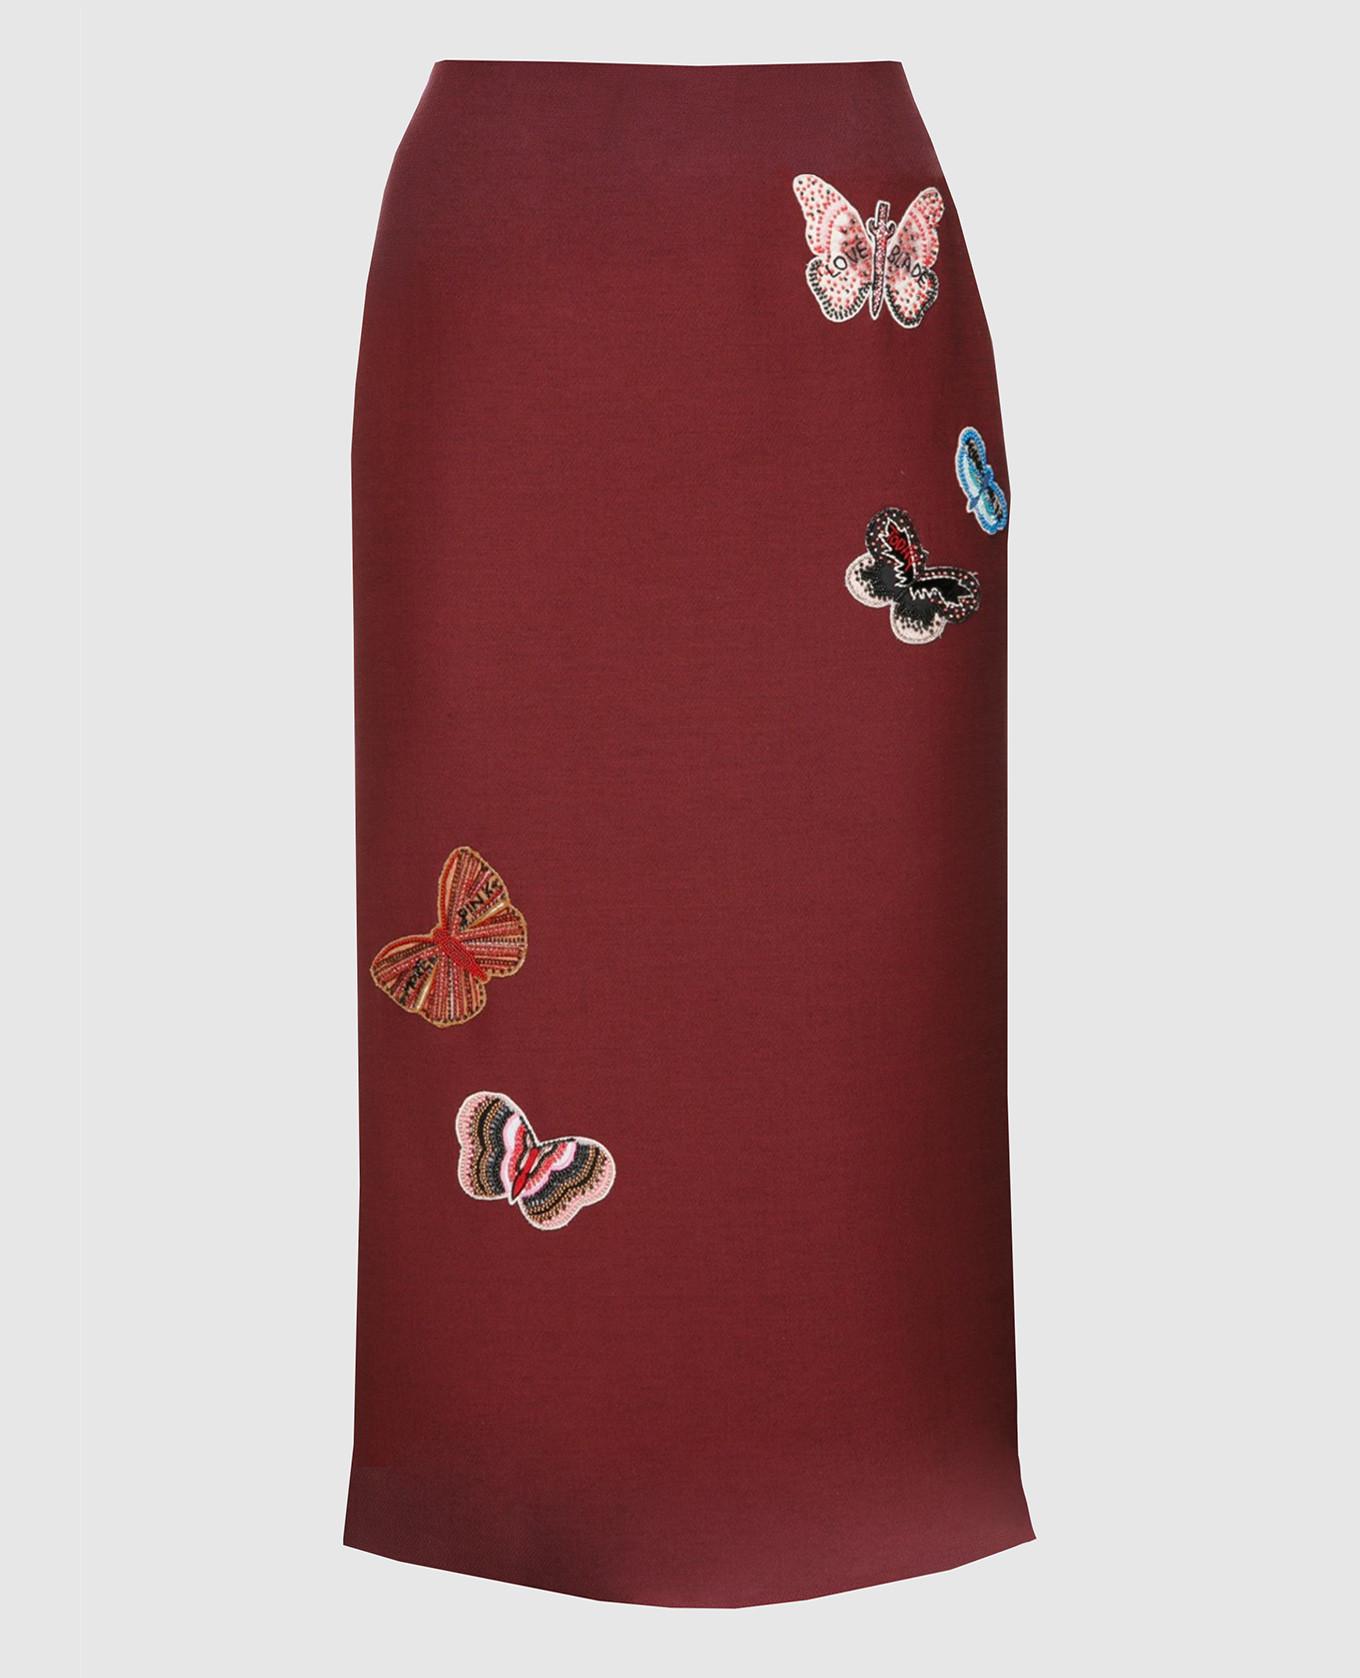 Бордовая юбка  из шерсти и шелка